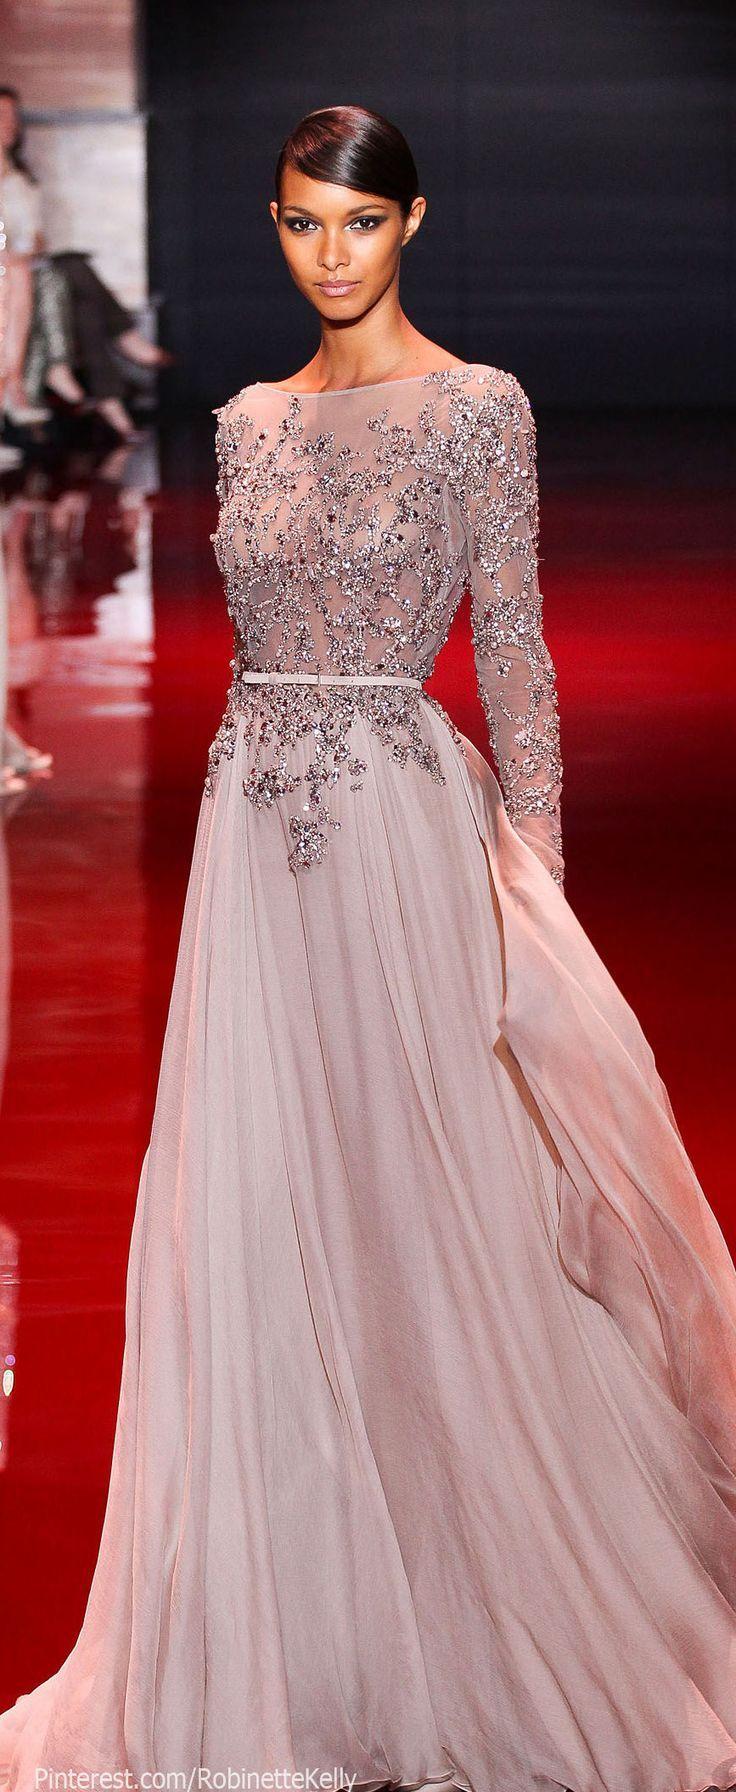 Elie Saab Haute Couture FW Ium obsessed with Elie Saab